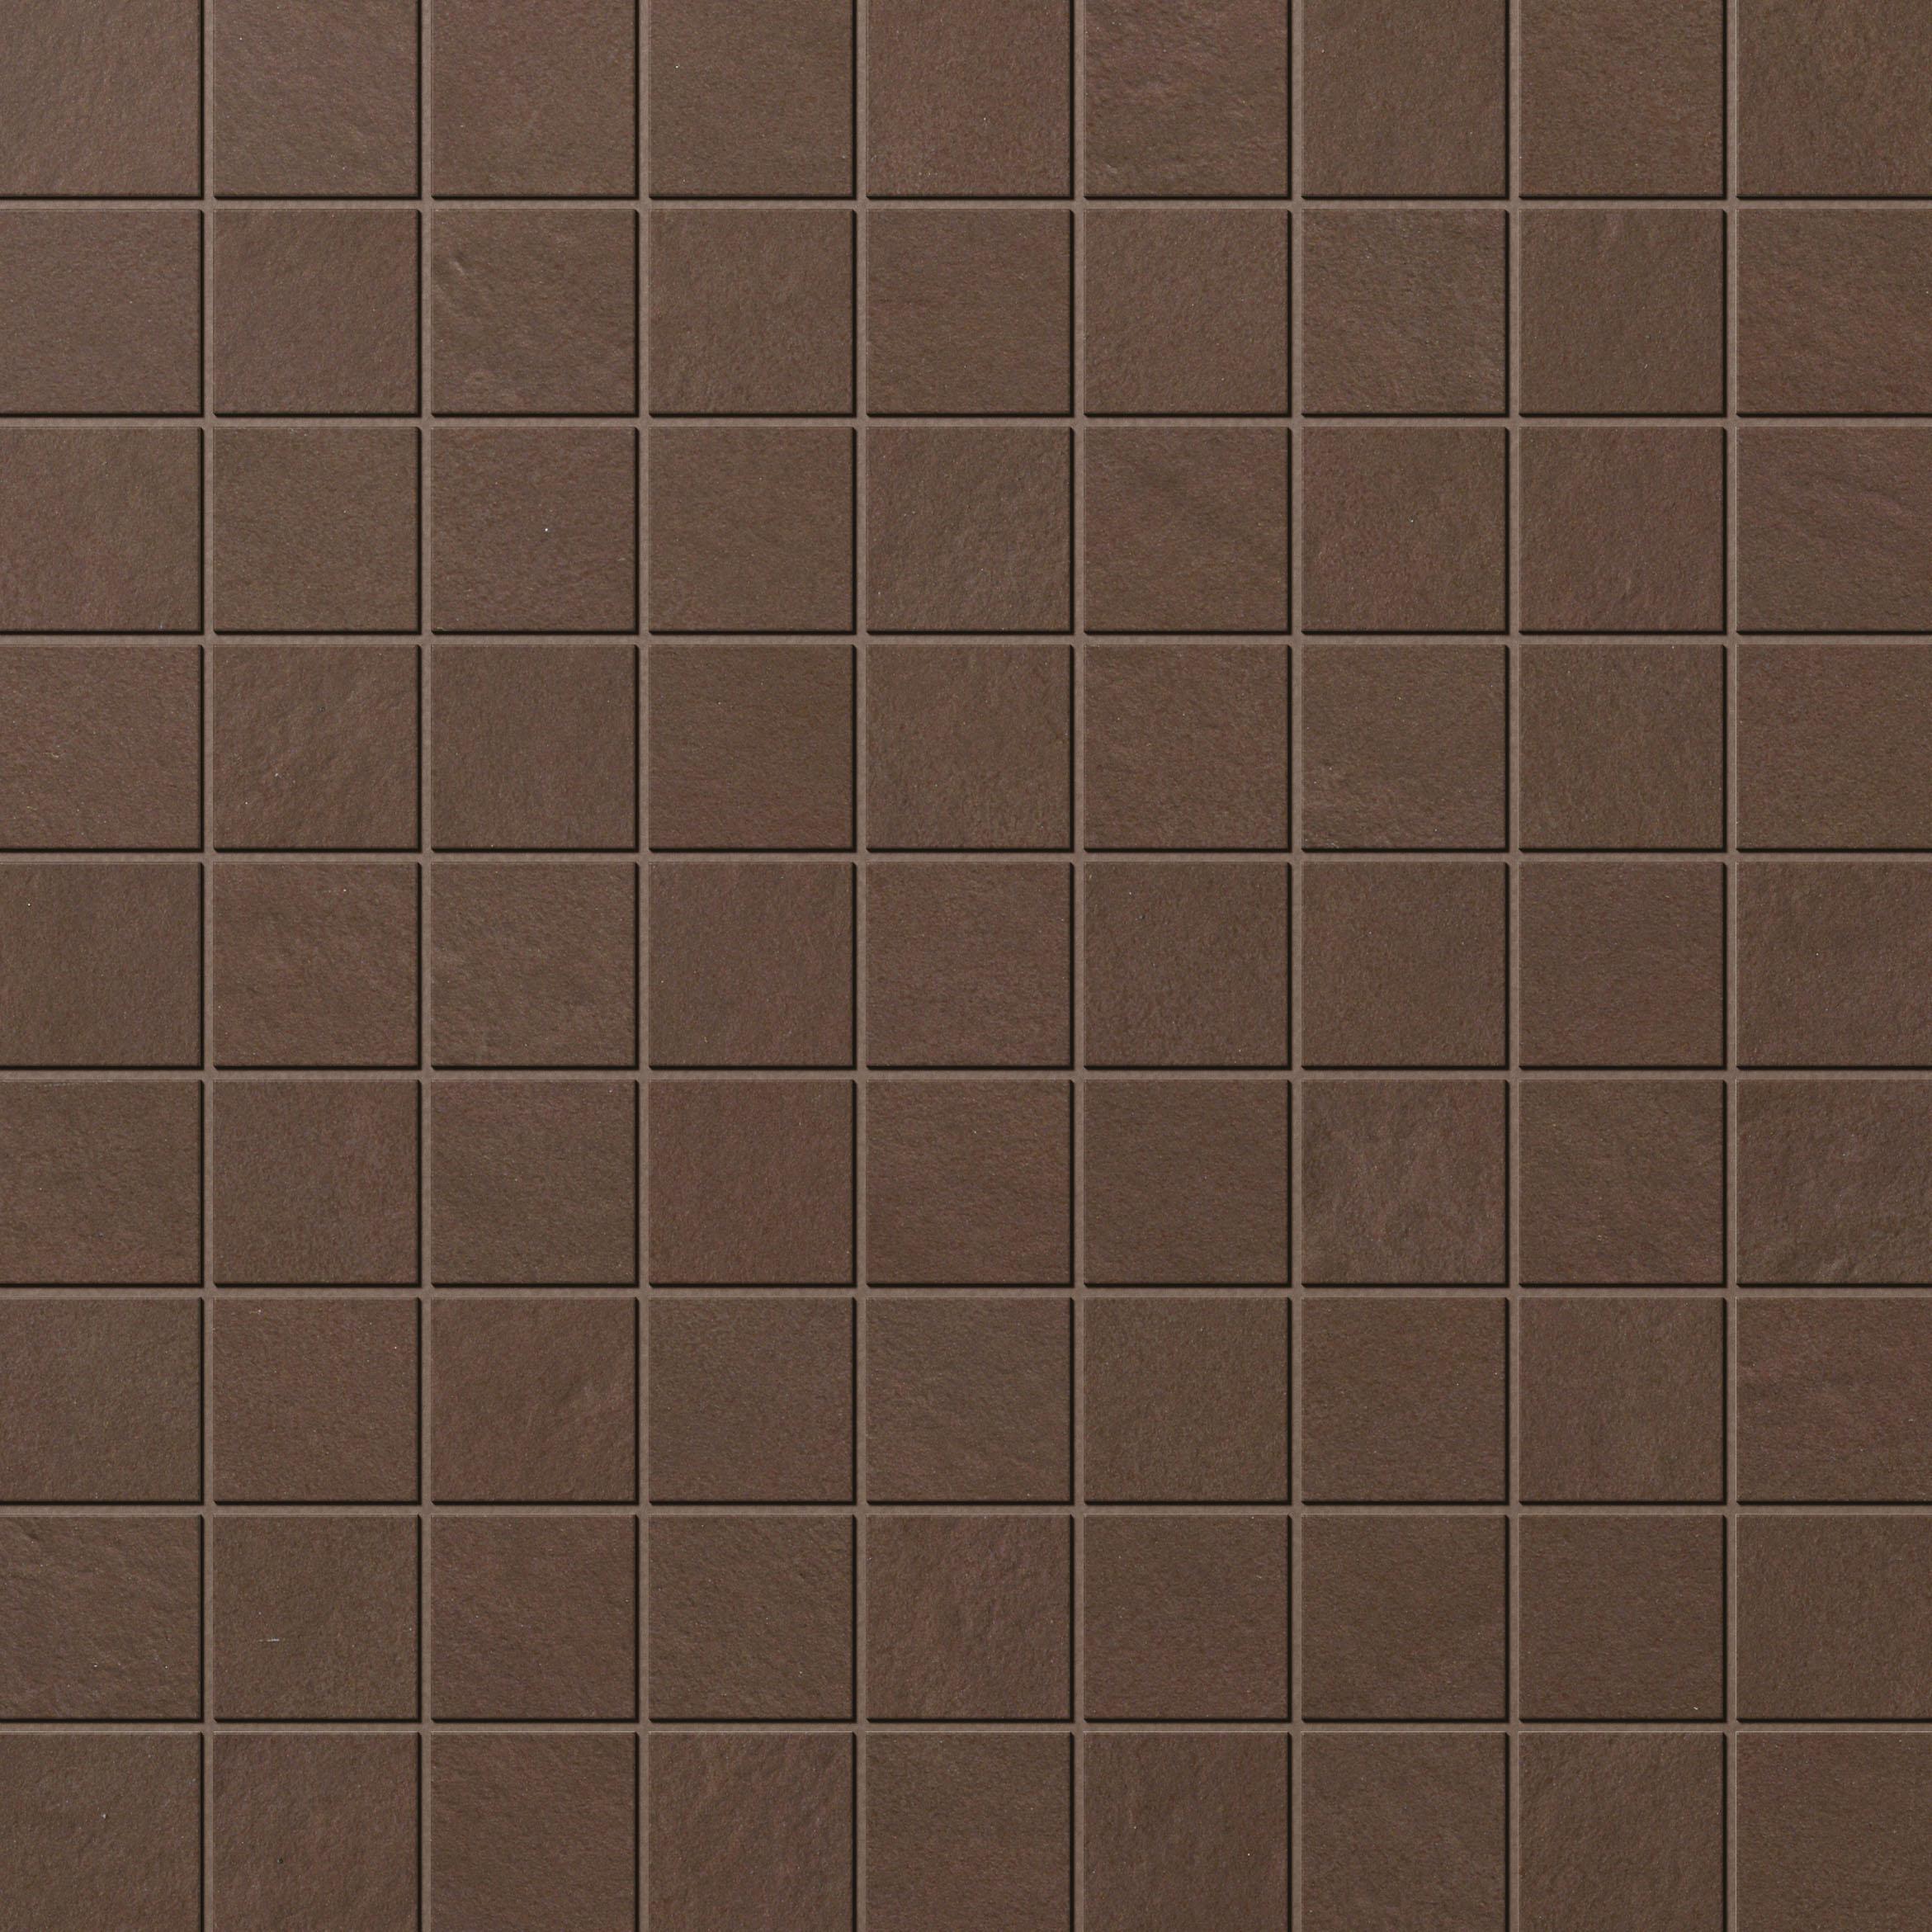 Mosaic 3,1x3,1 Brown